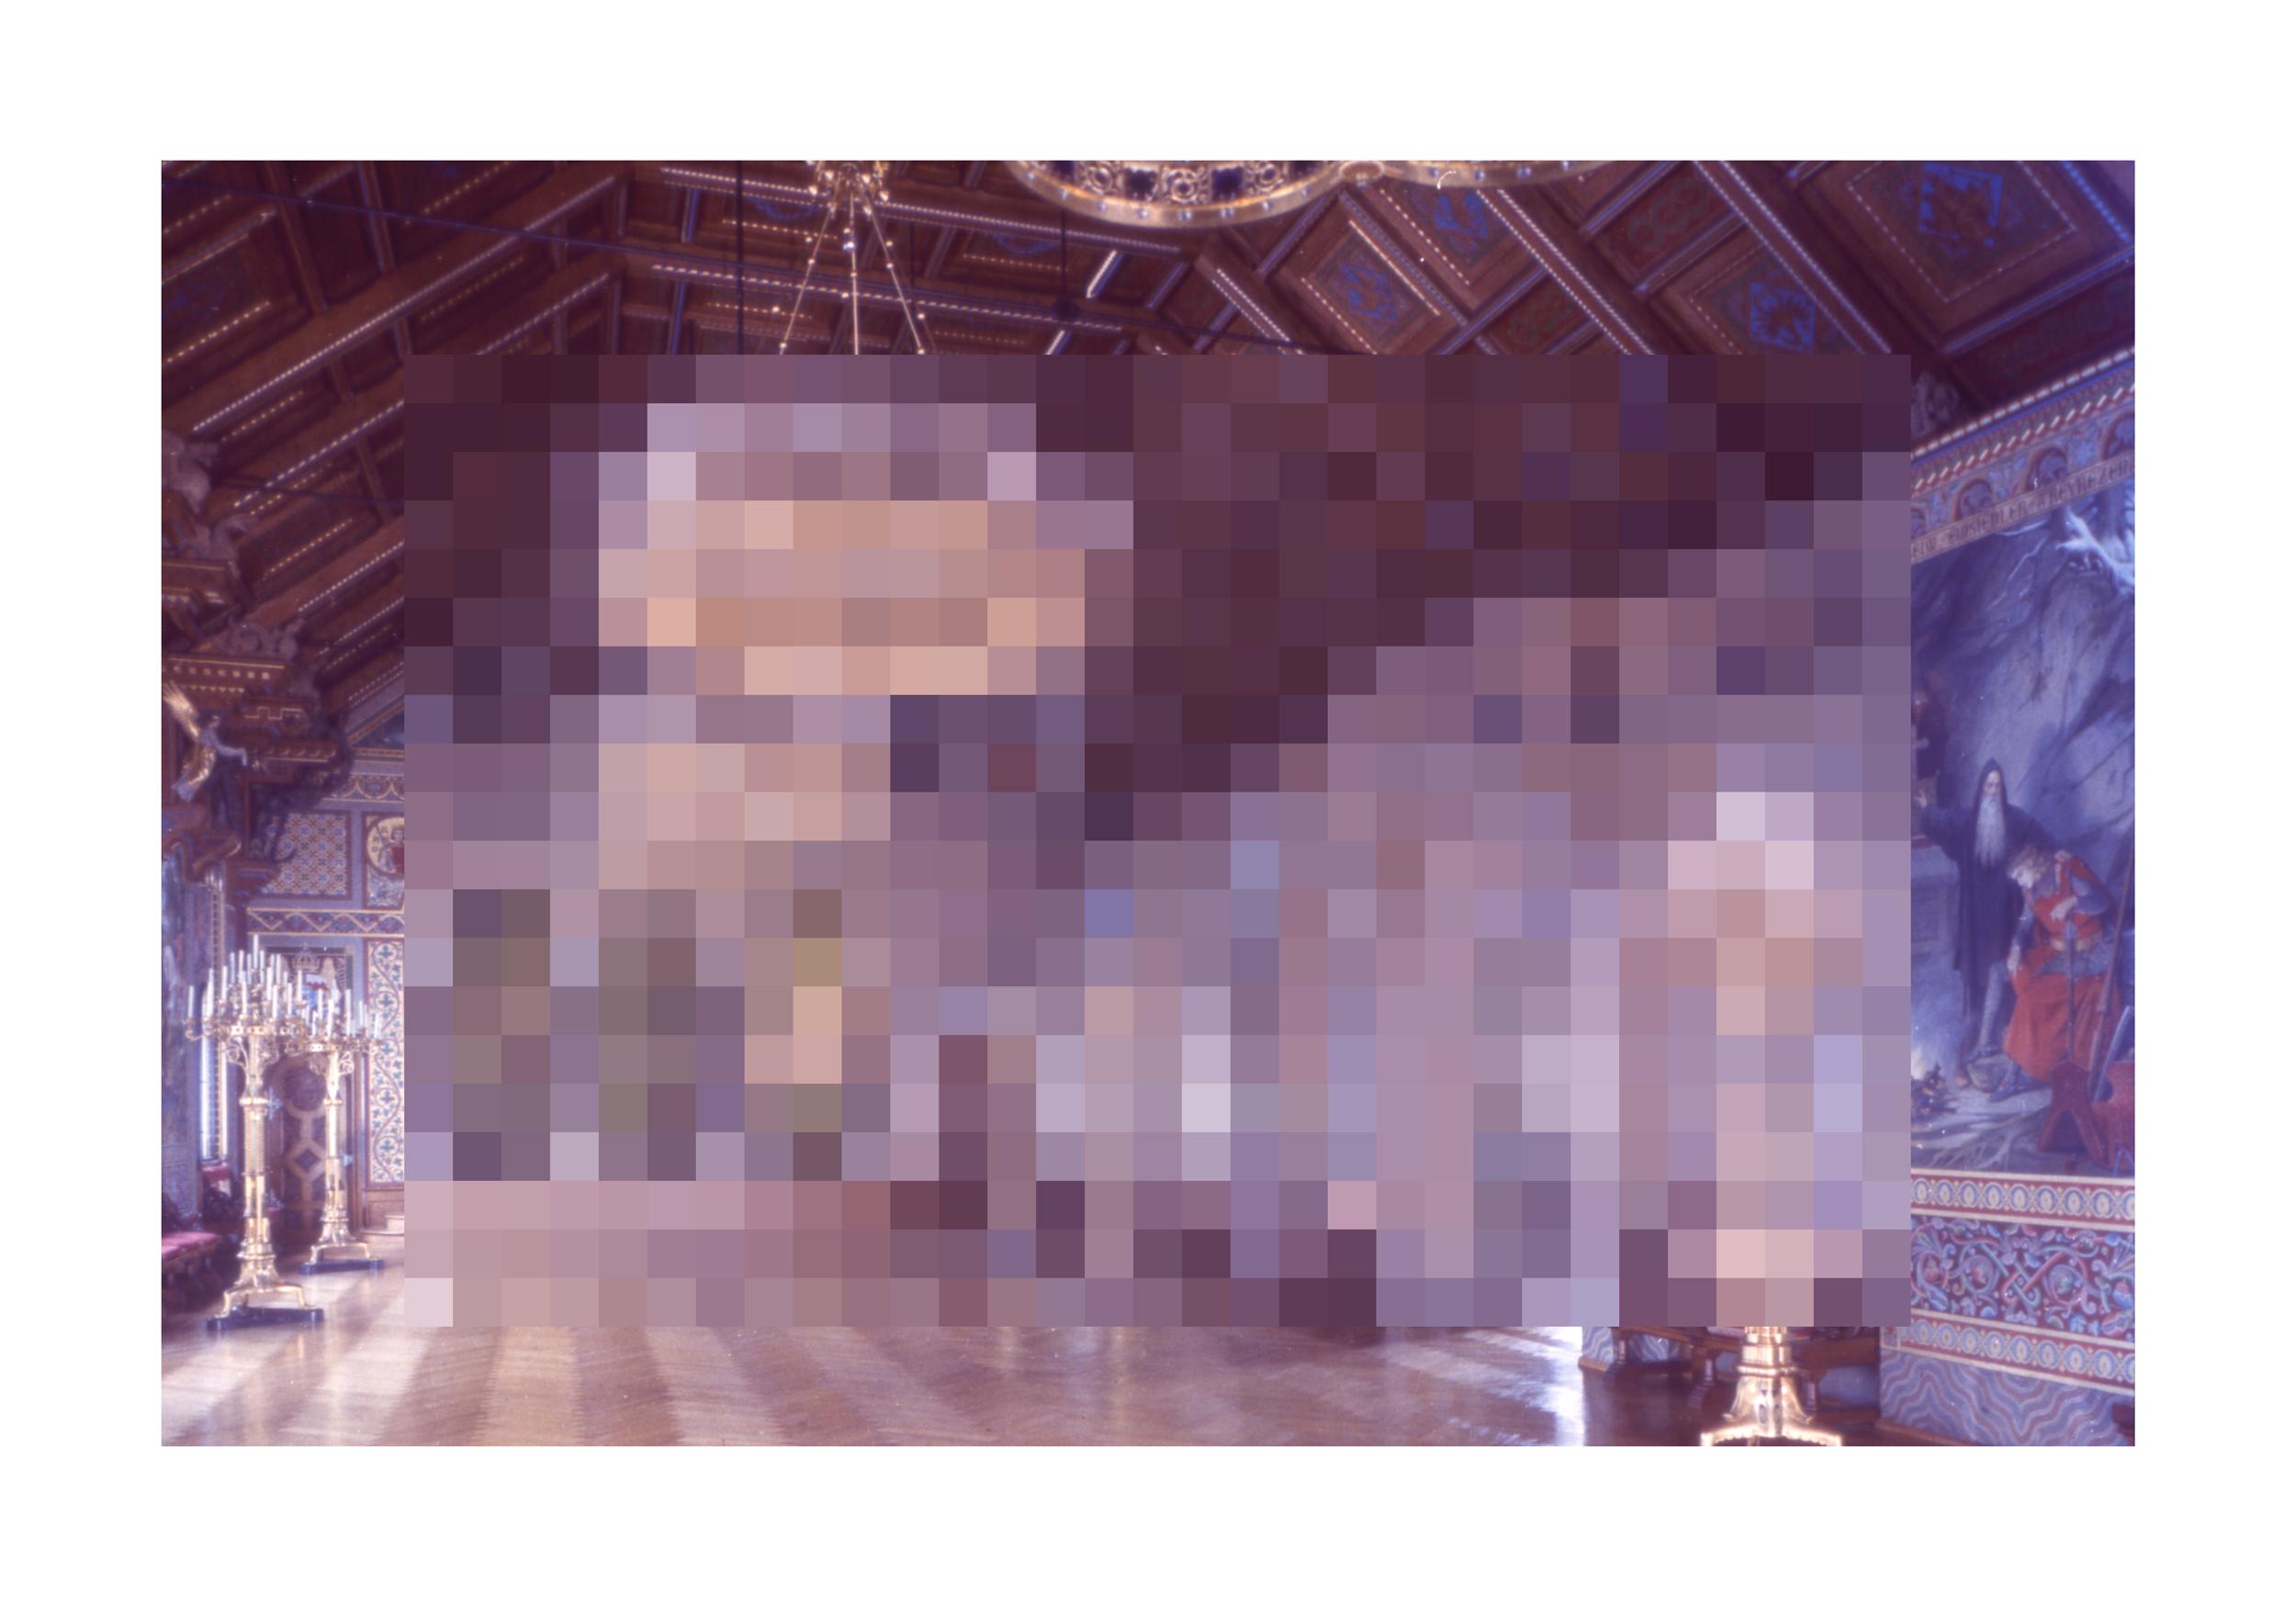 Untitled (p059), 2014